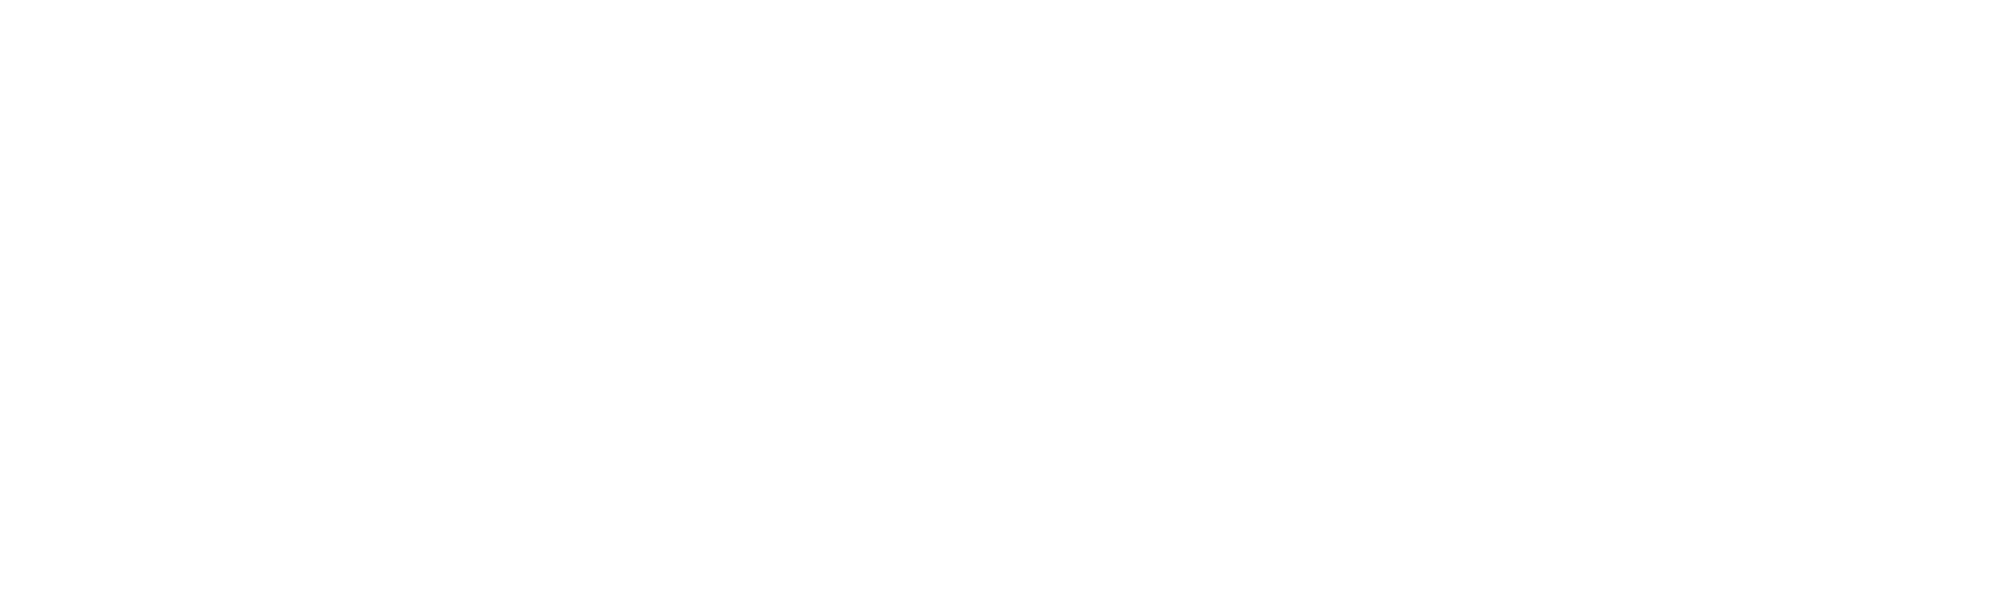 Tonio's Tabaco